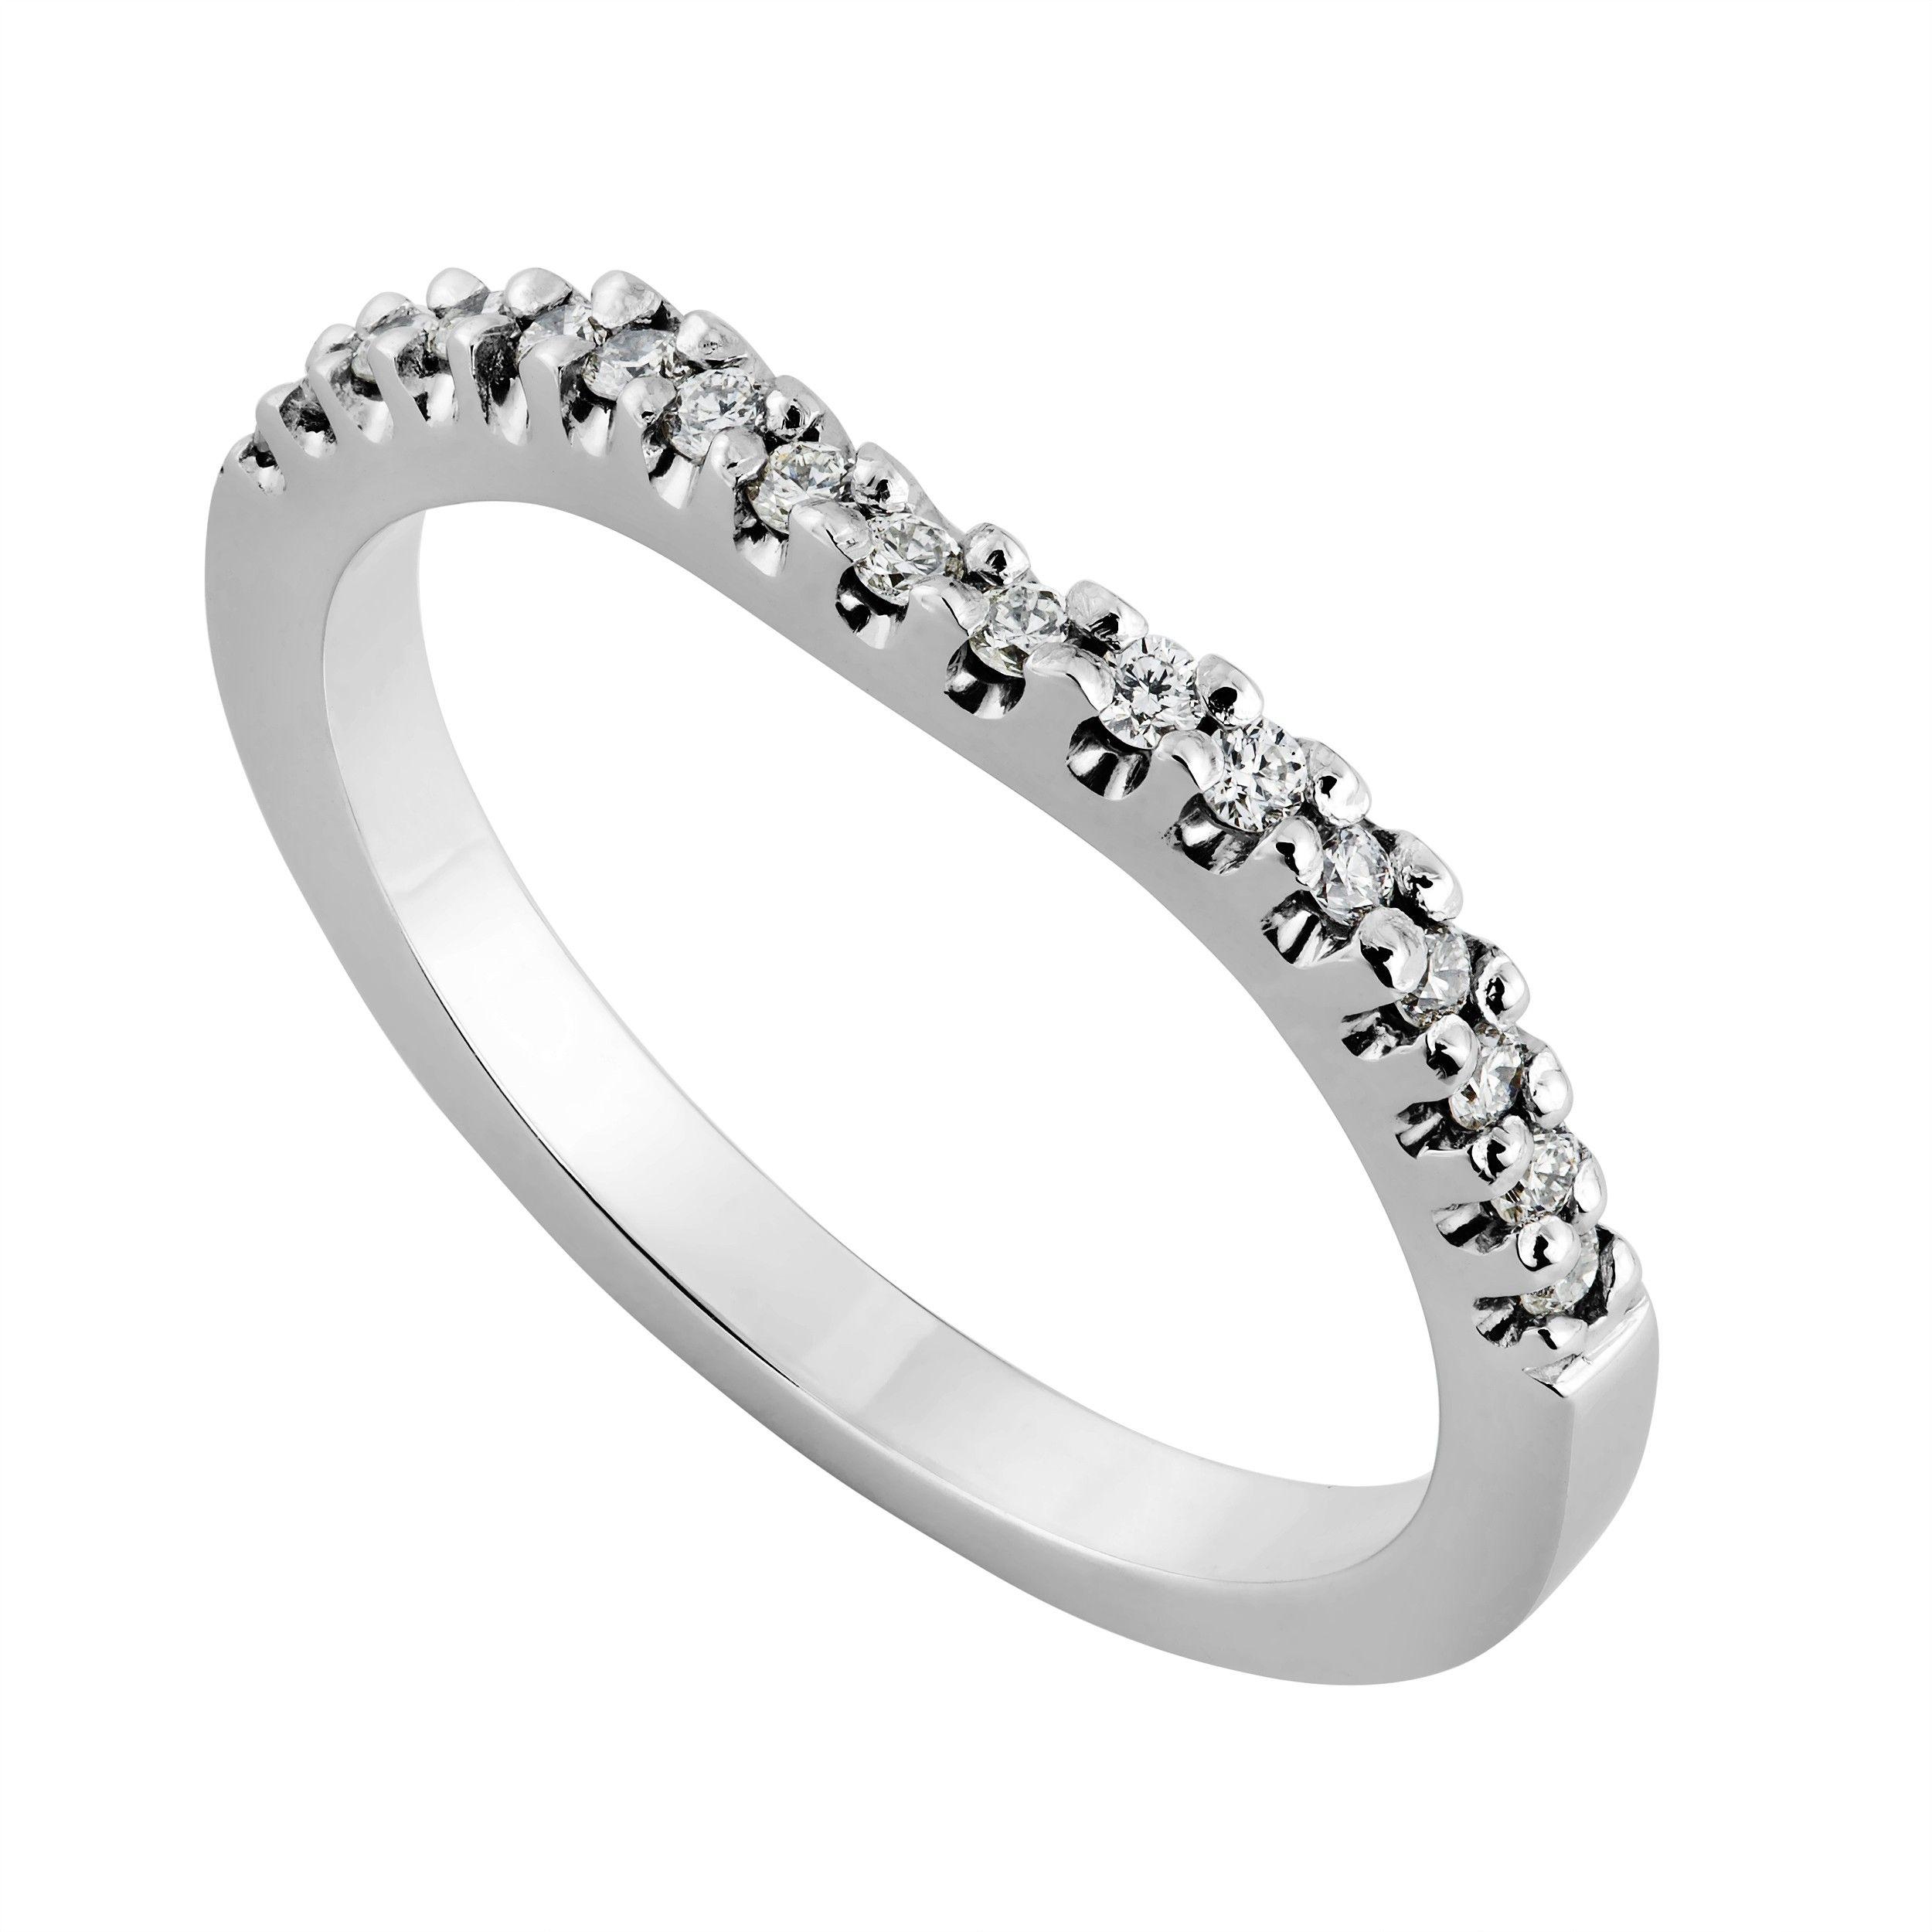 Ladies' 18ct white gold 0.16 carat diamond shaped 2mm